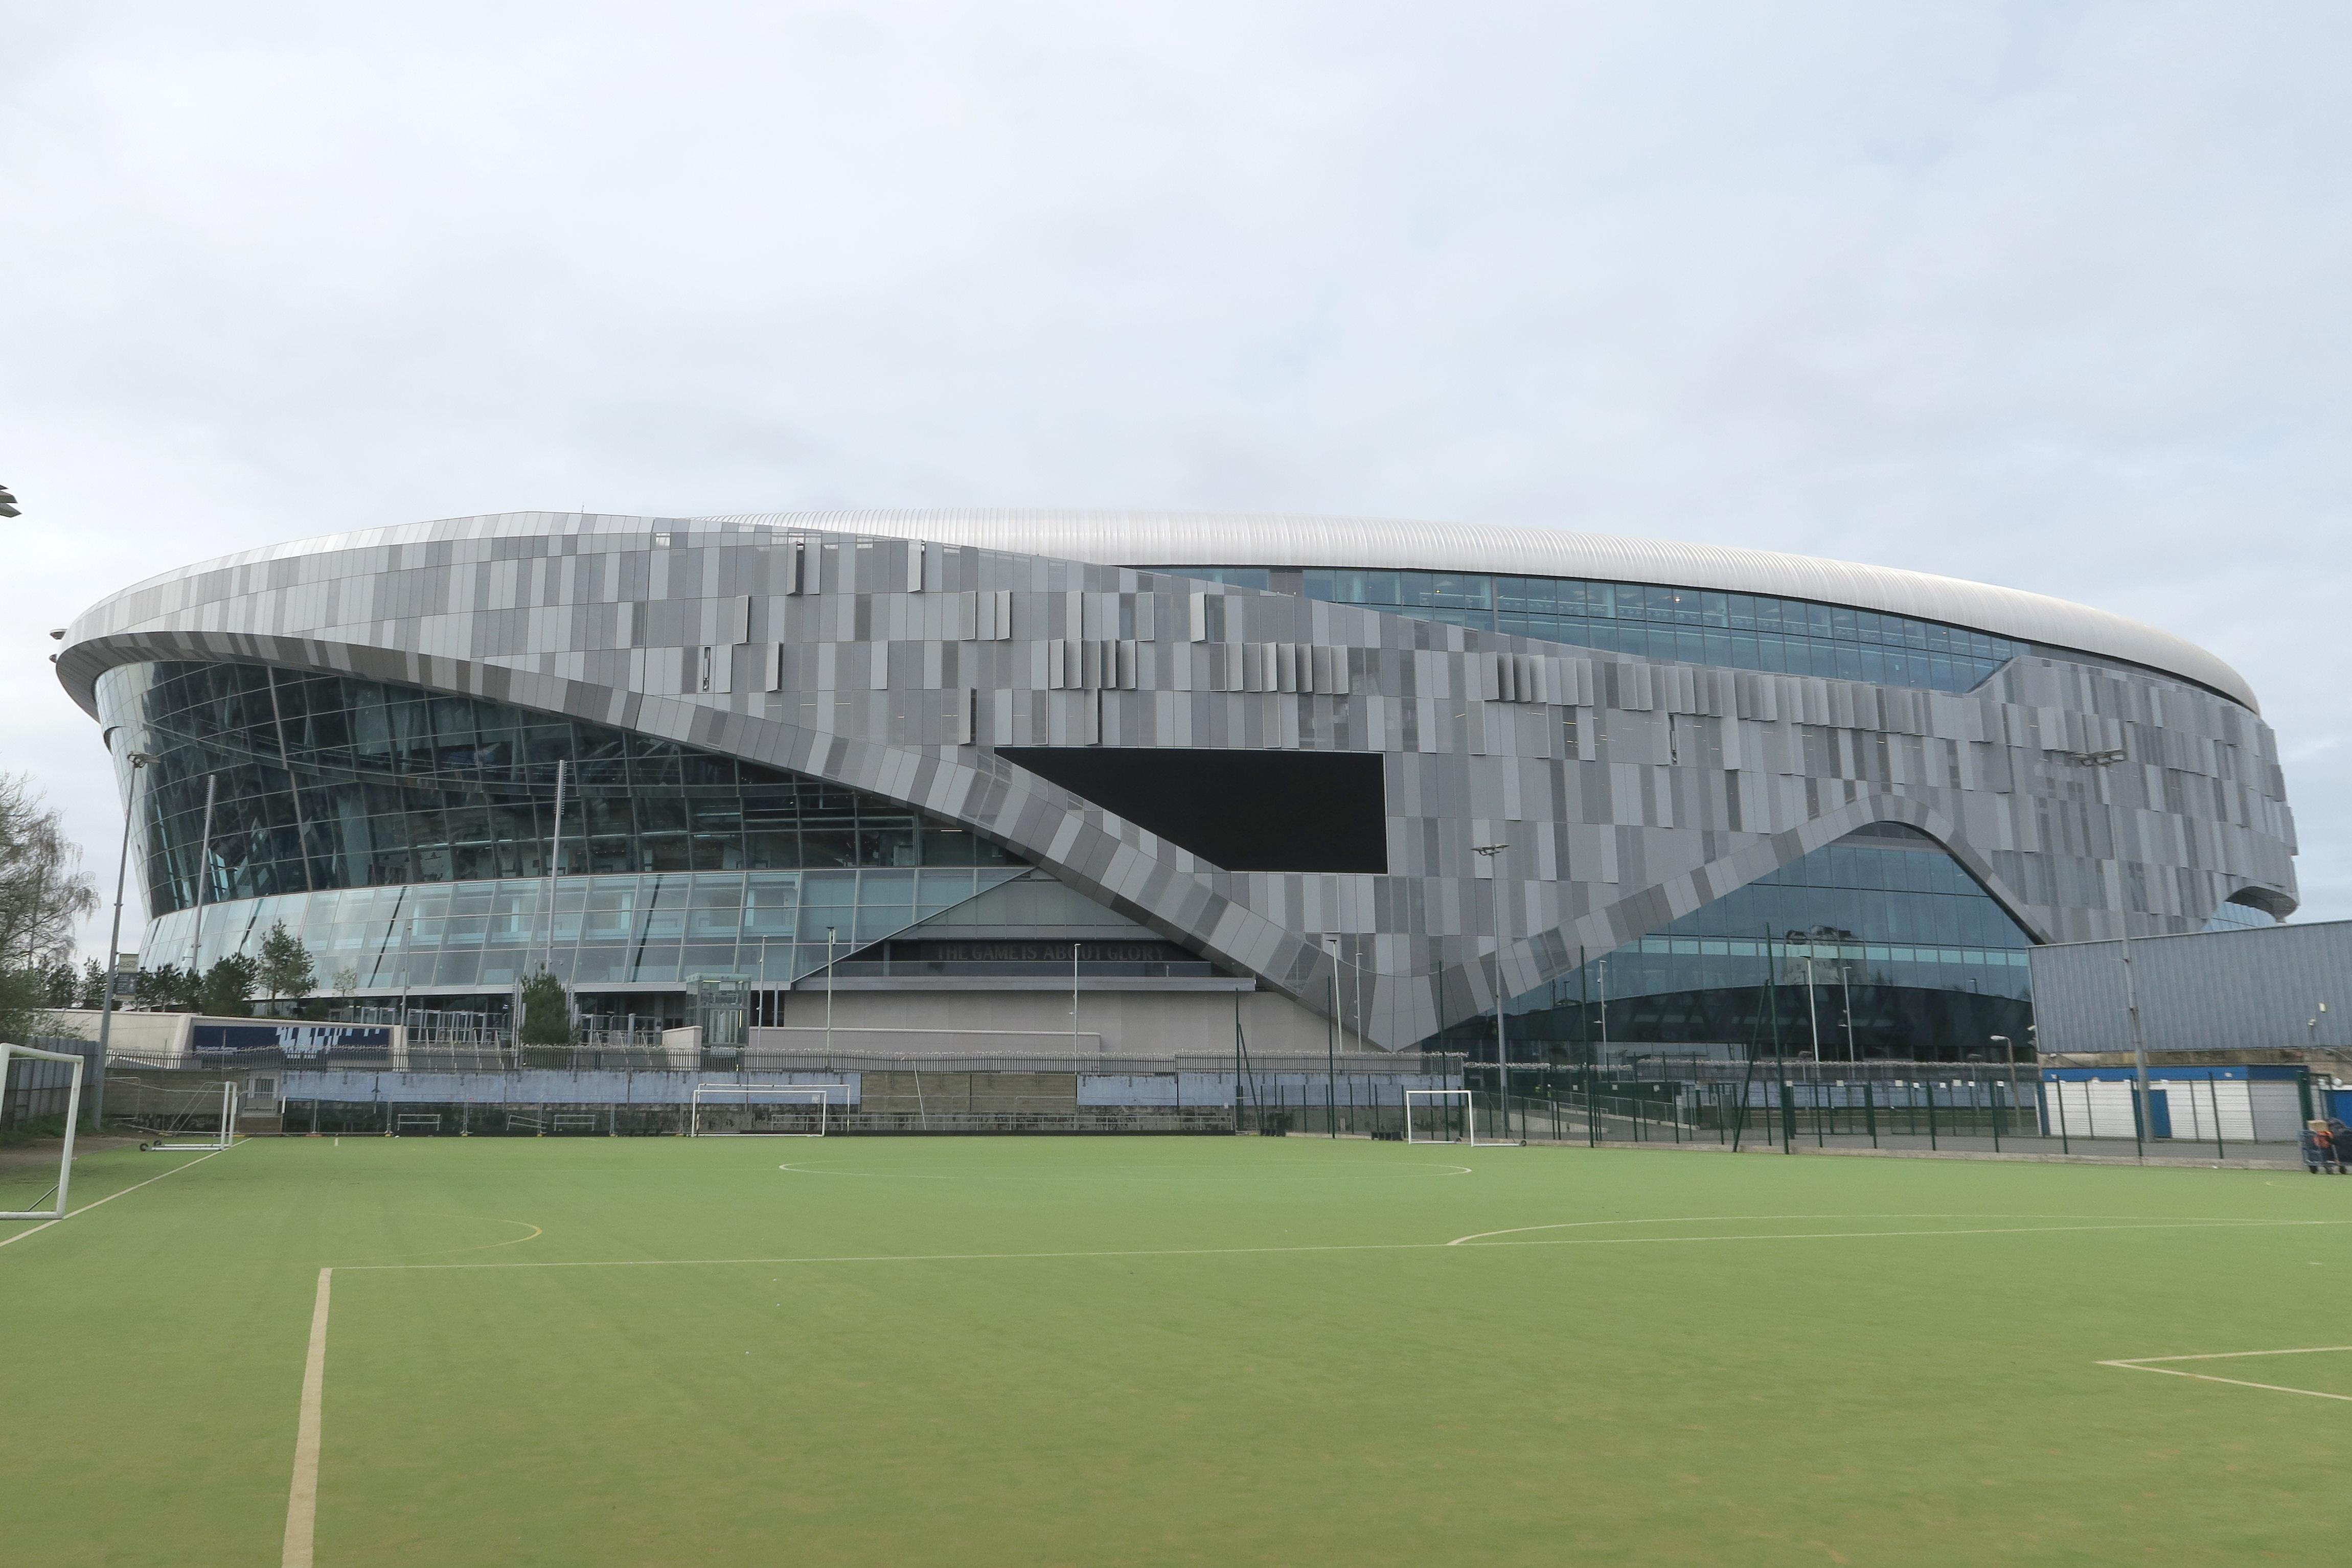 Tottenham_Hotspur_Stadium_March_2019_-_view_from_east